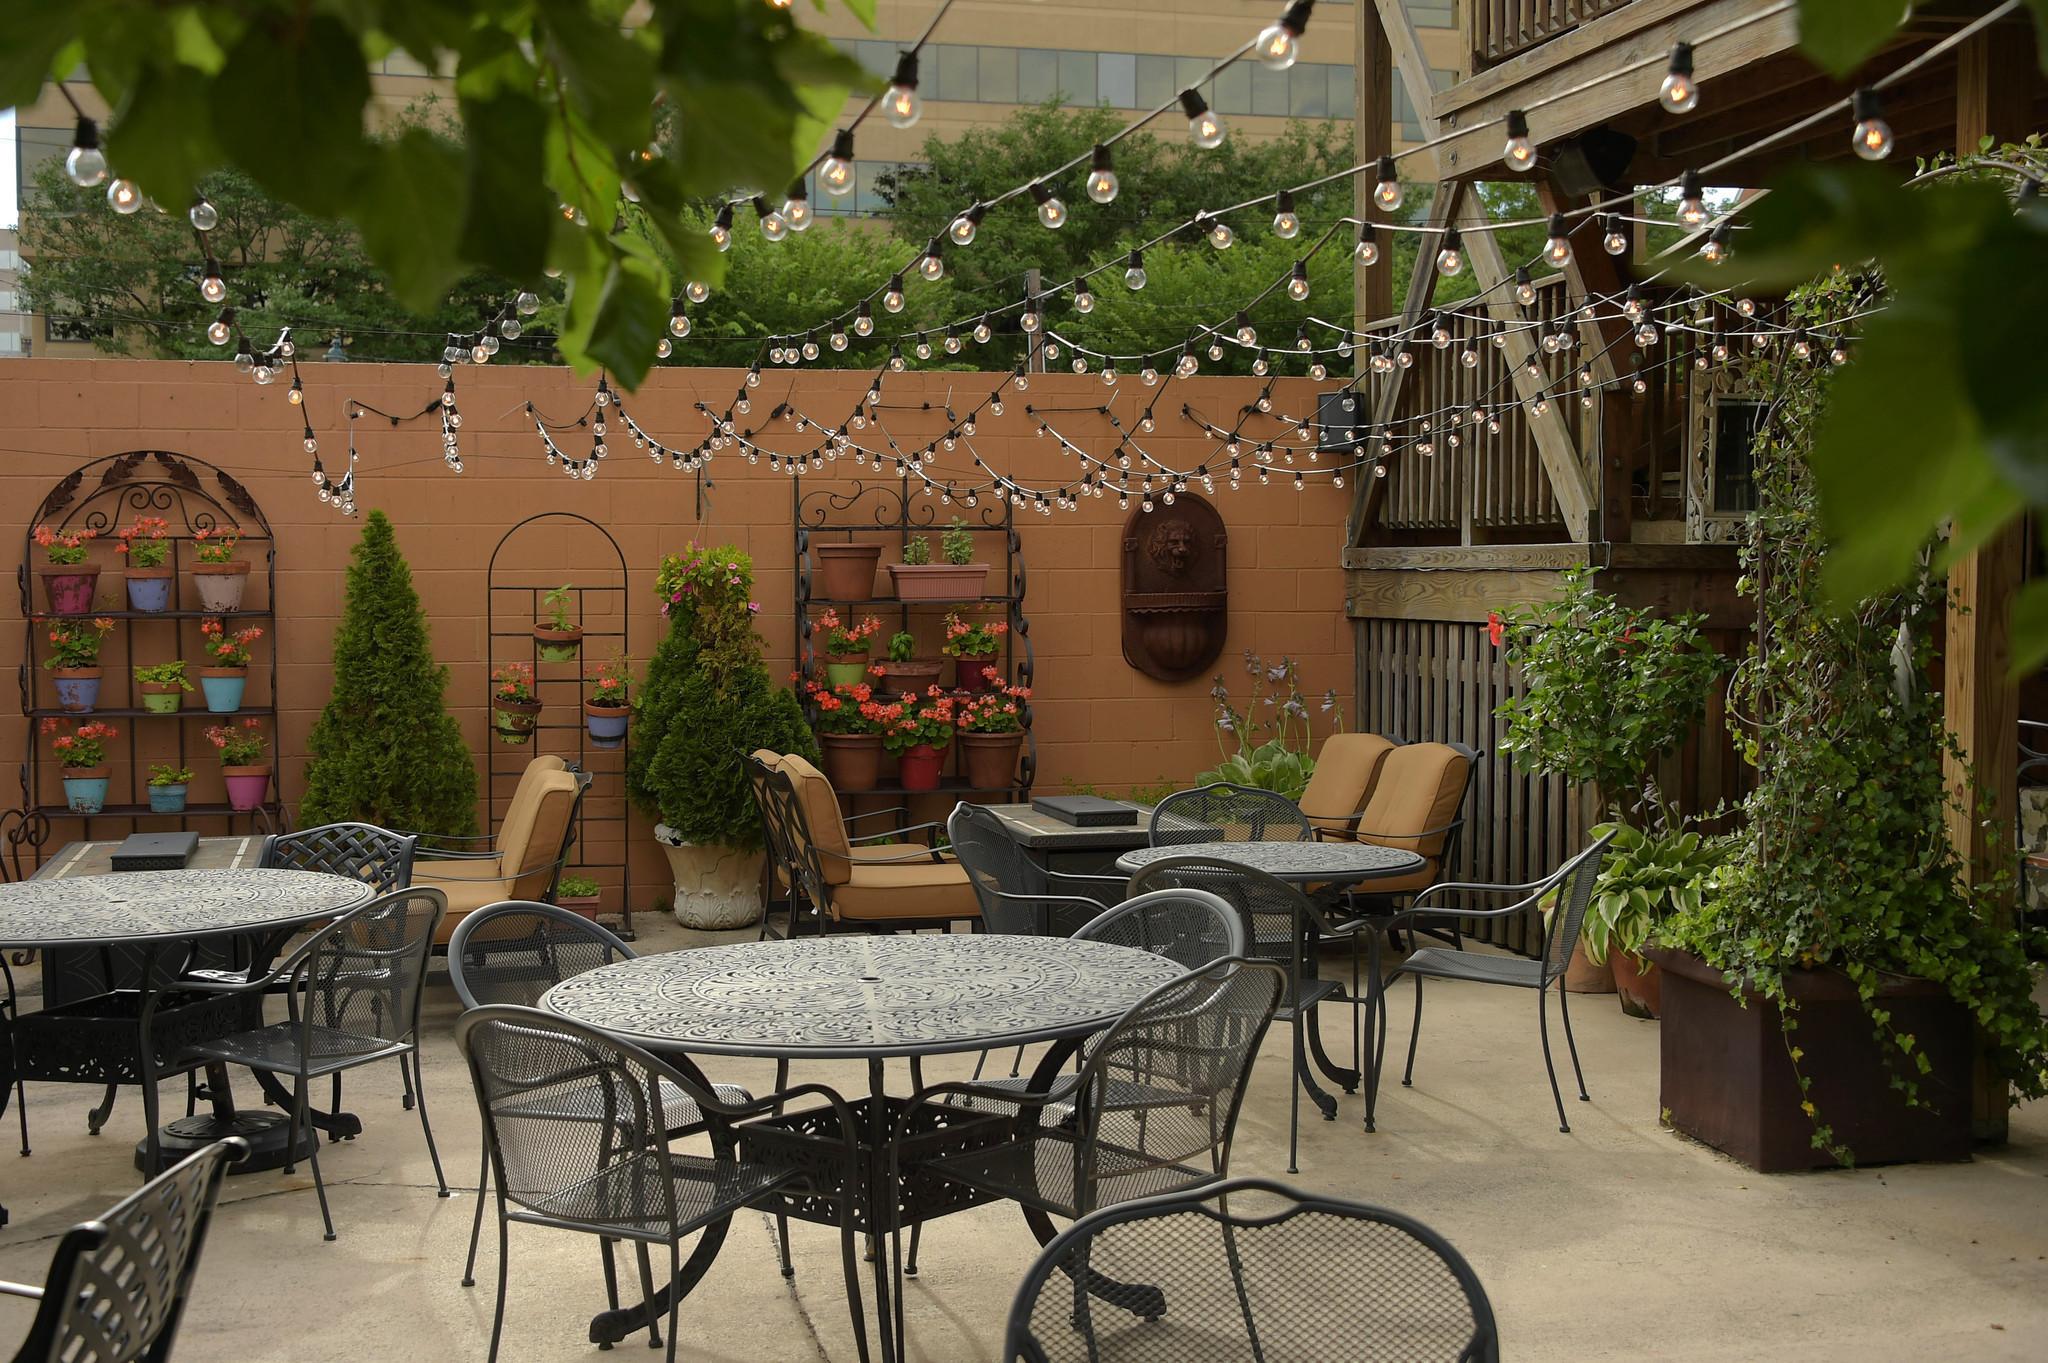 Hot Spots Restaurants Create Elaborate Outdoor Seating